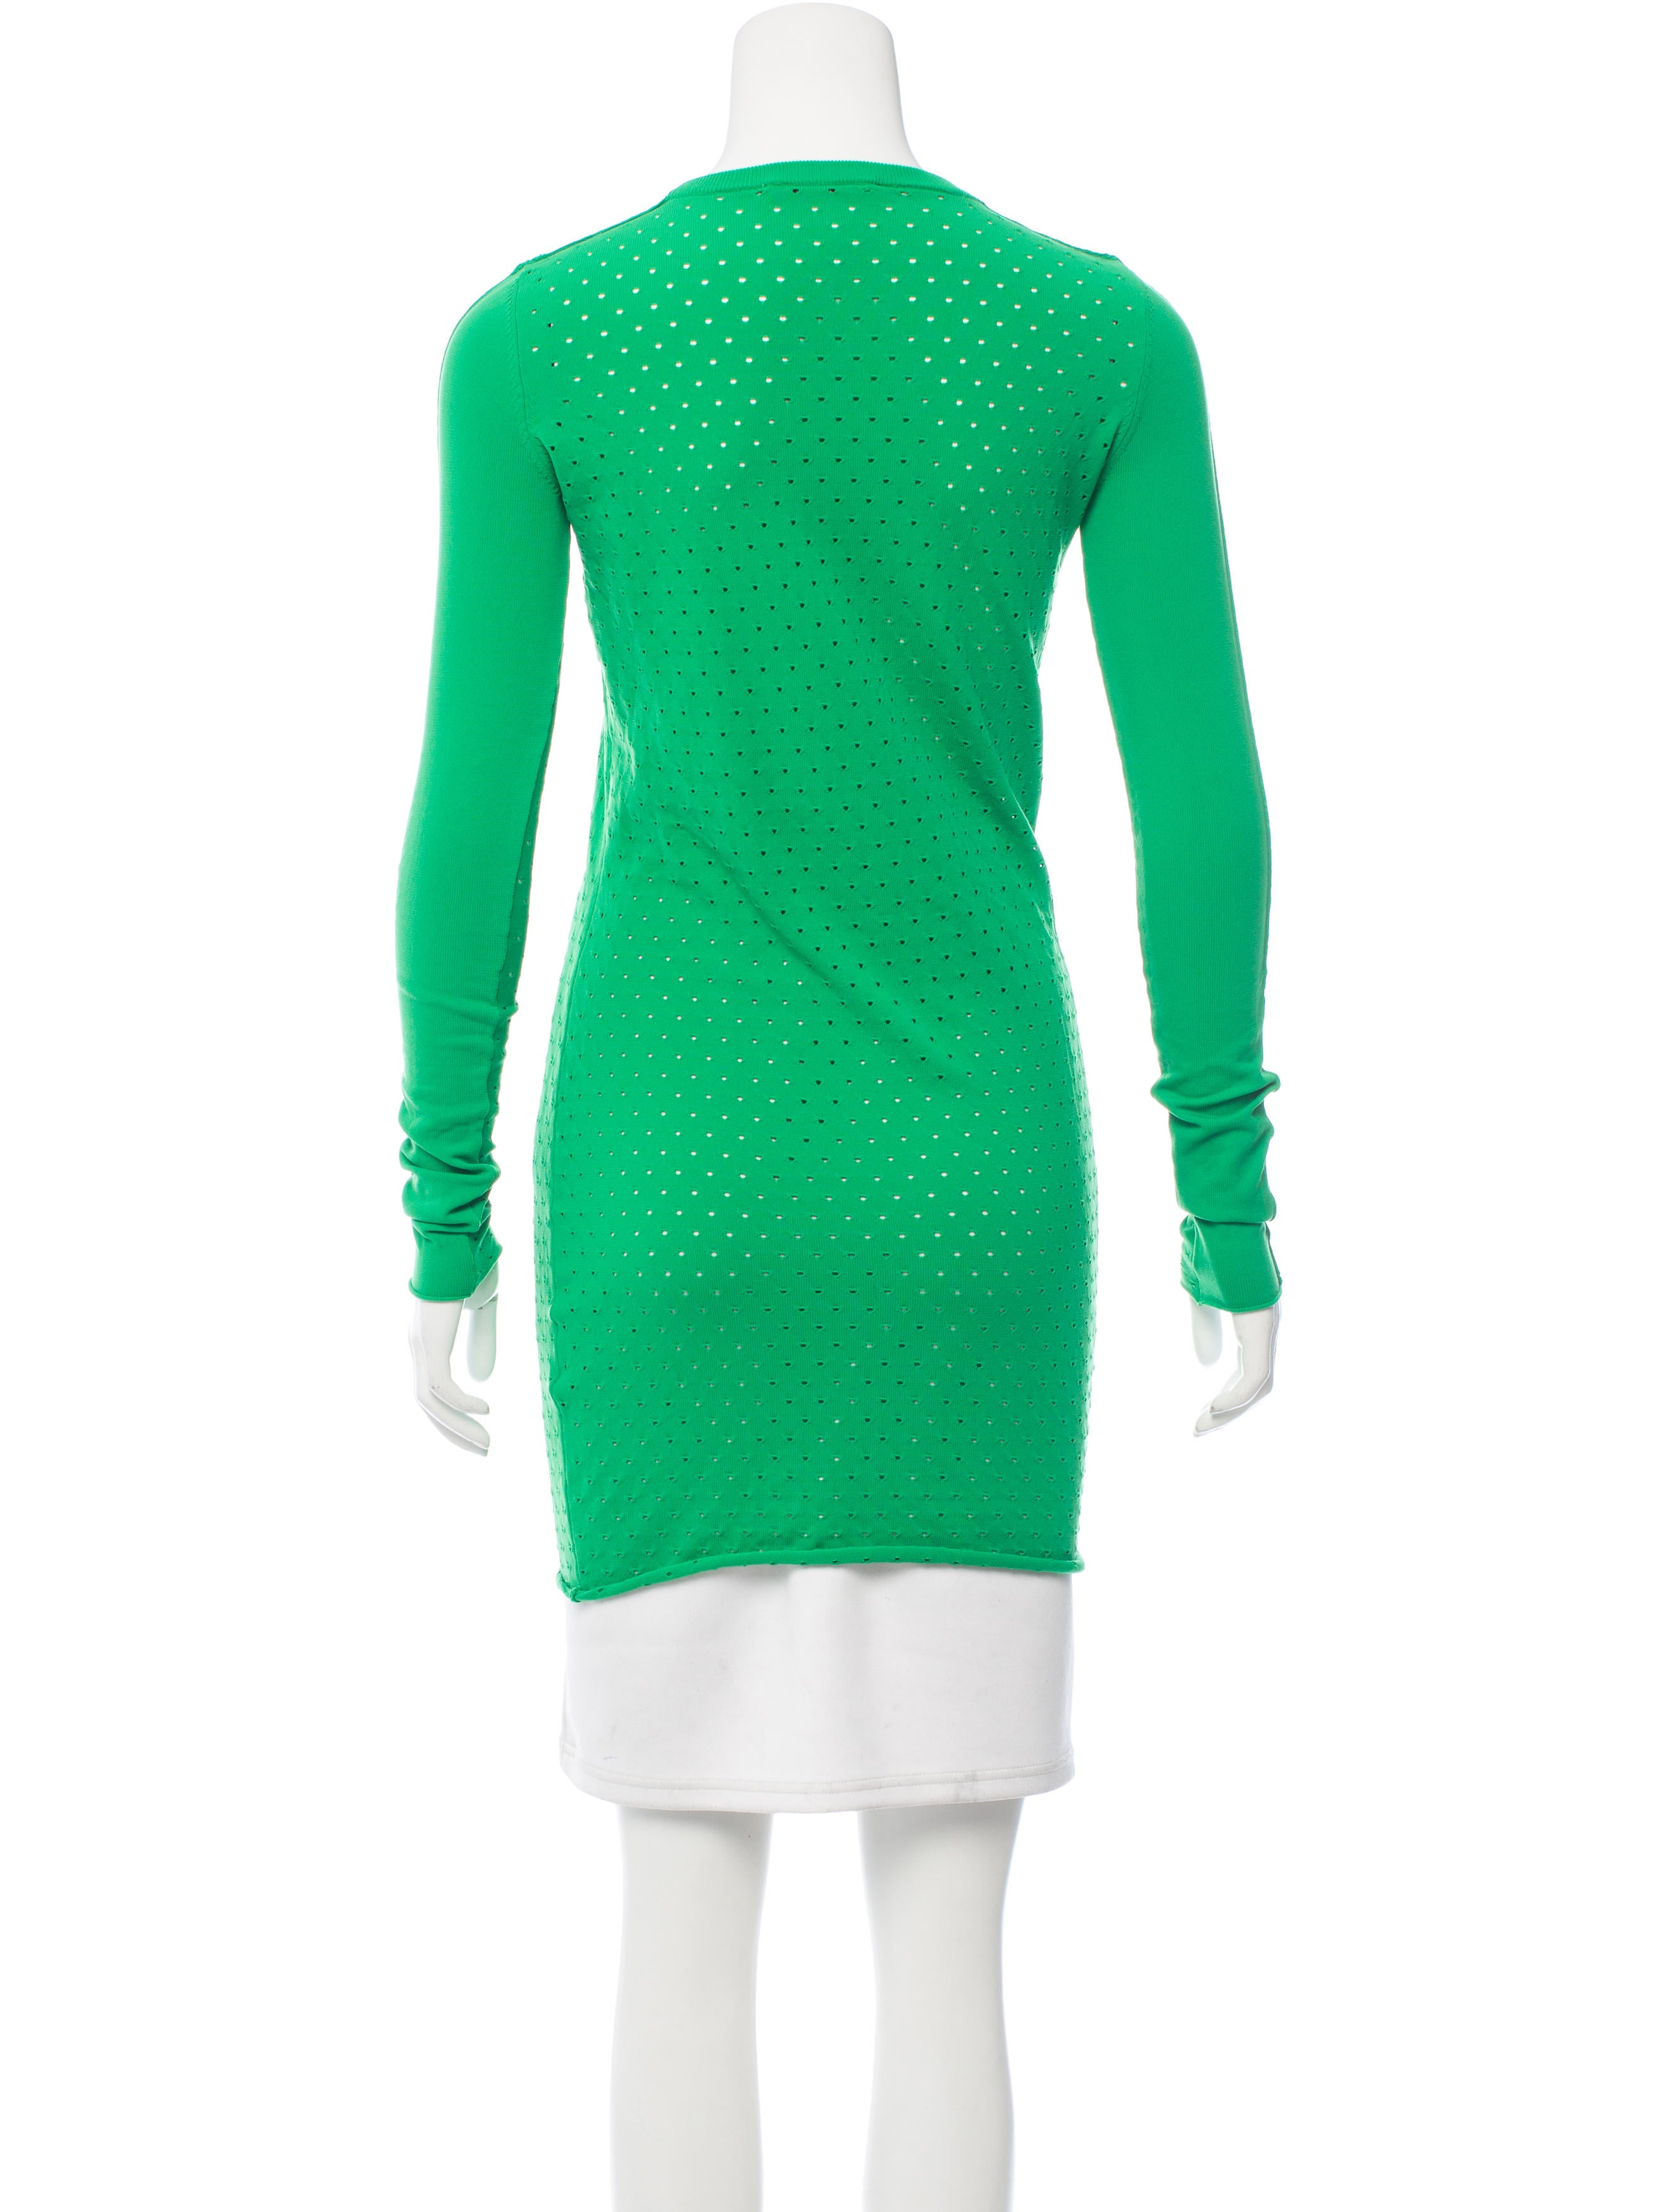 Acne Studios Marx Holes Dress Clothing Acn30561 The